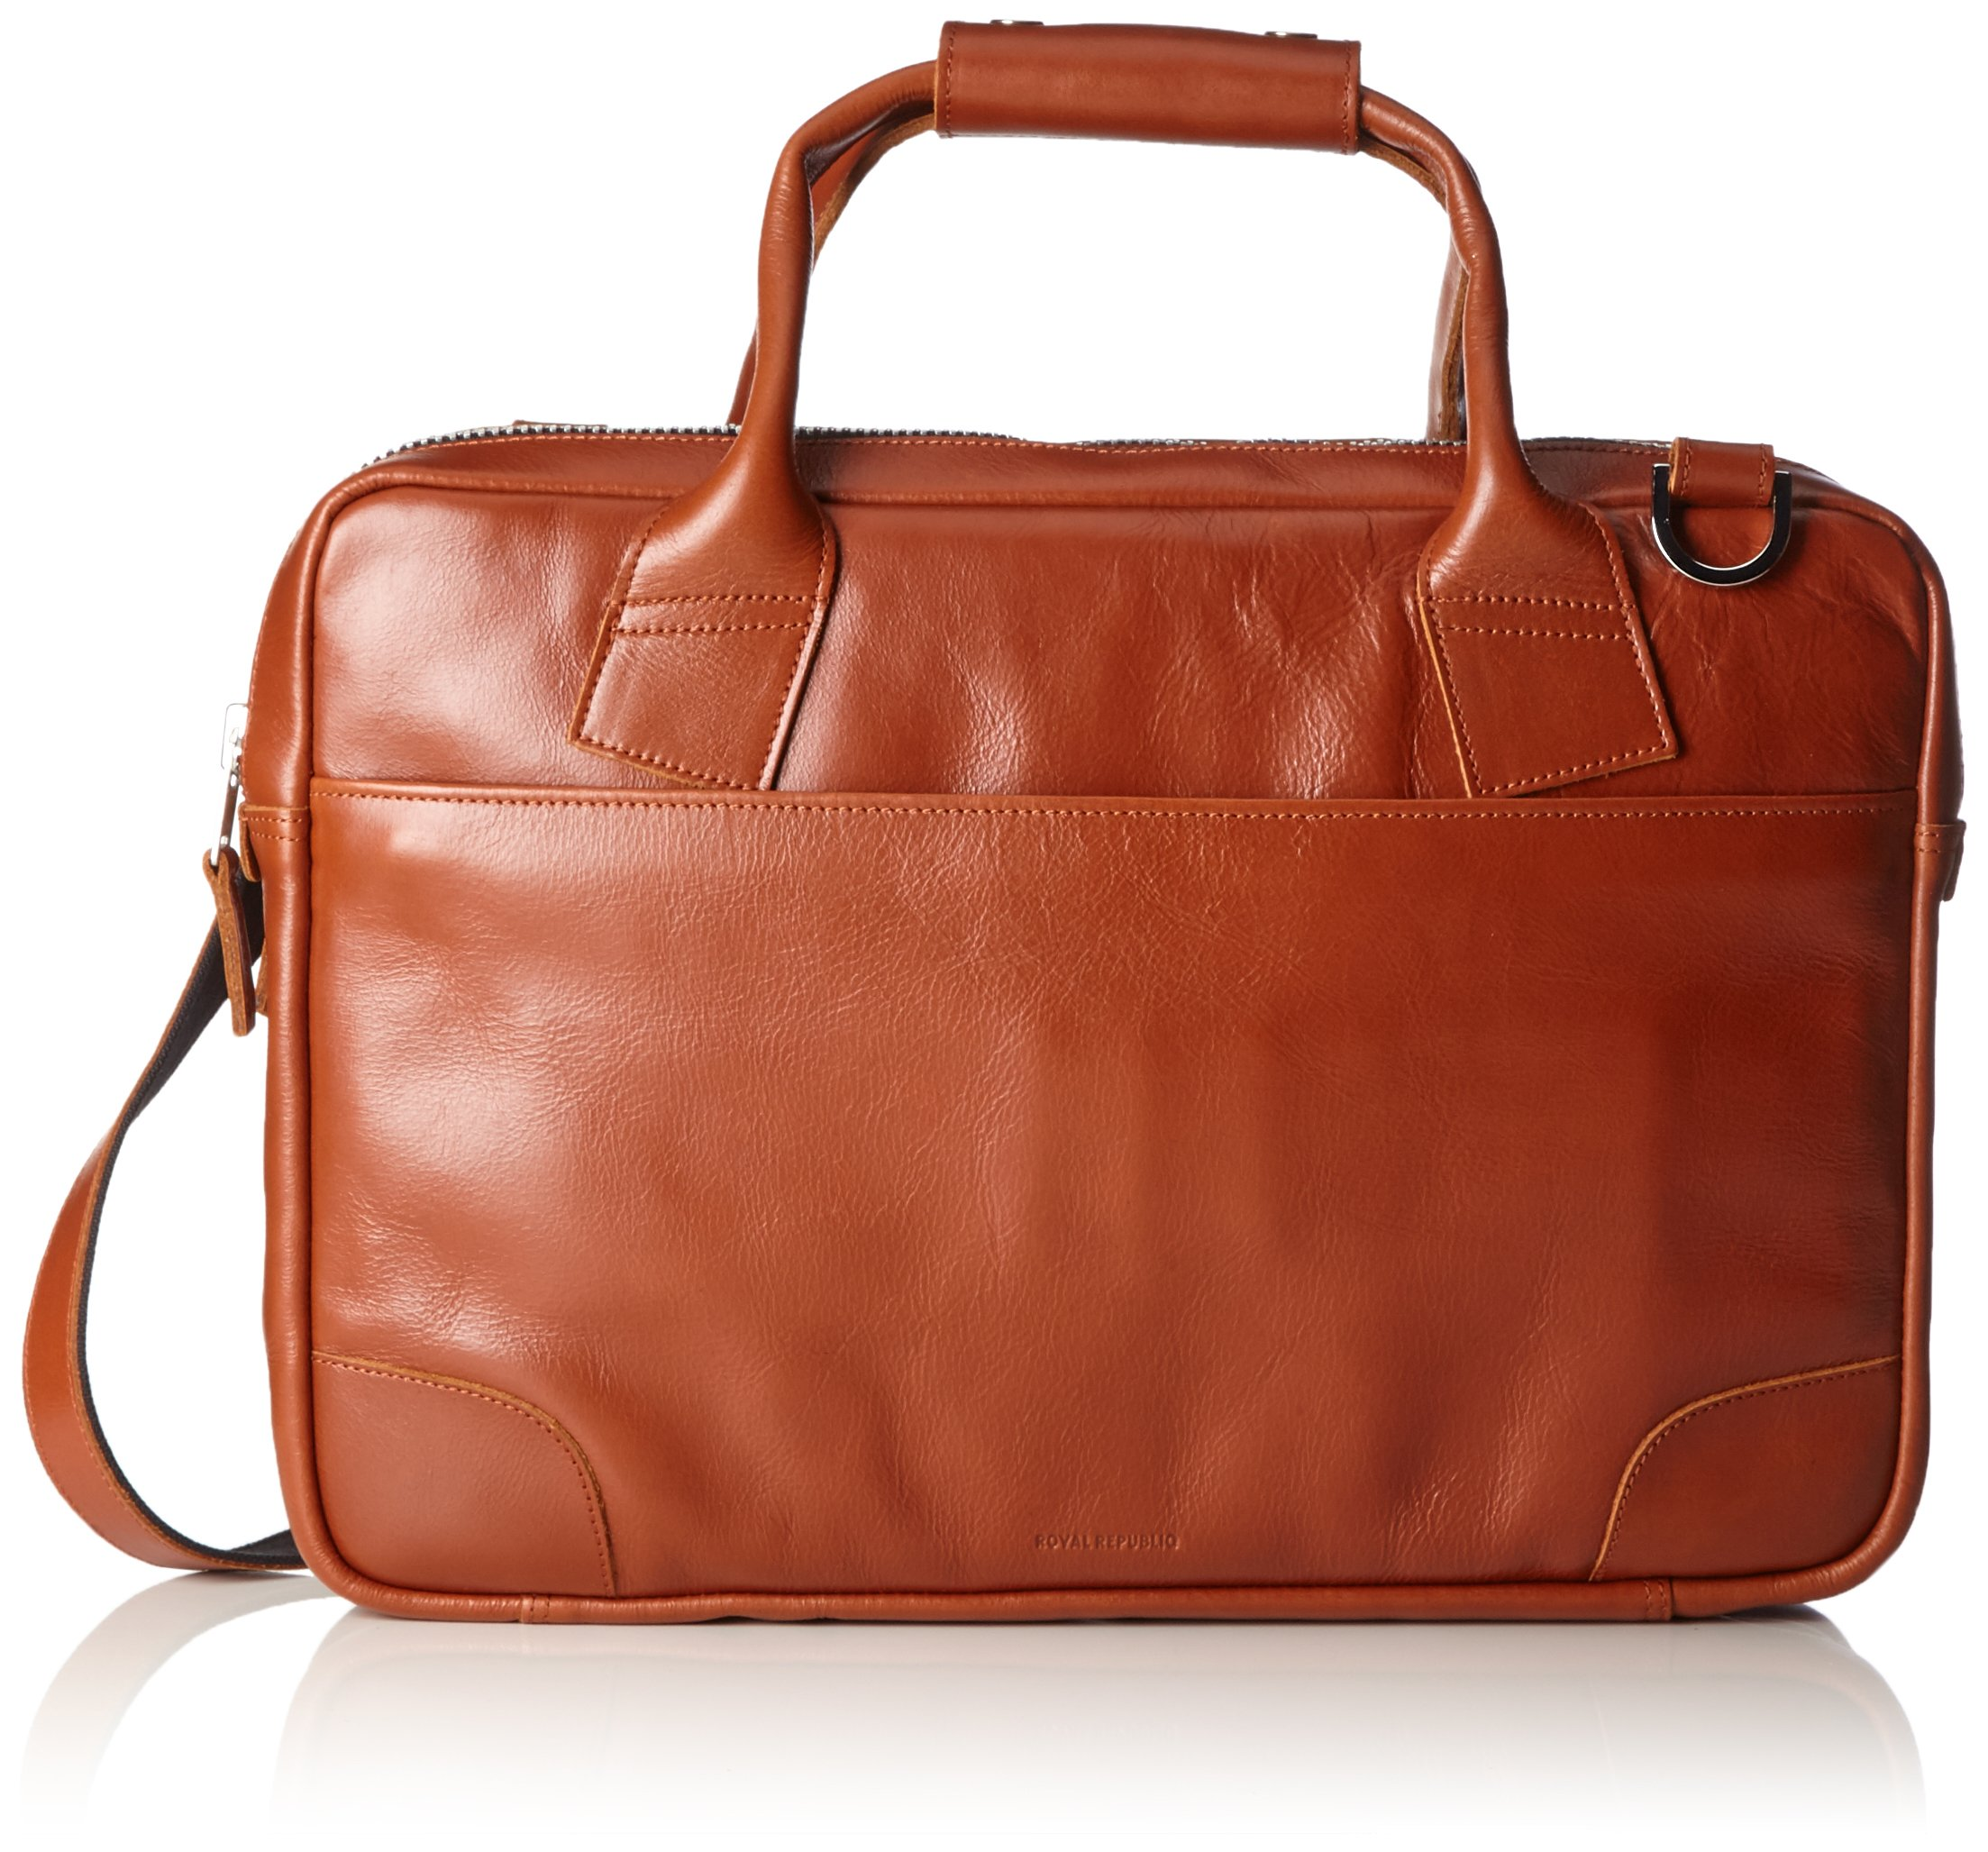 Portable Zip Pour Cmb Republiq Nano LeatherSacs T Big Mixte Royal H AdulteBrauncognac12x29x41 X Ordinateur hdsrotQCxB